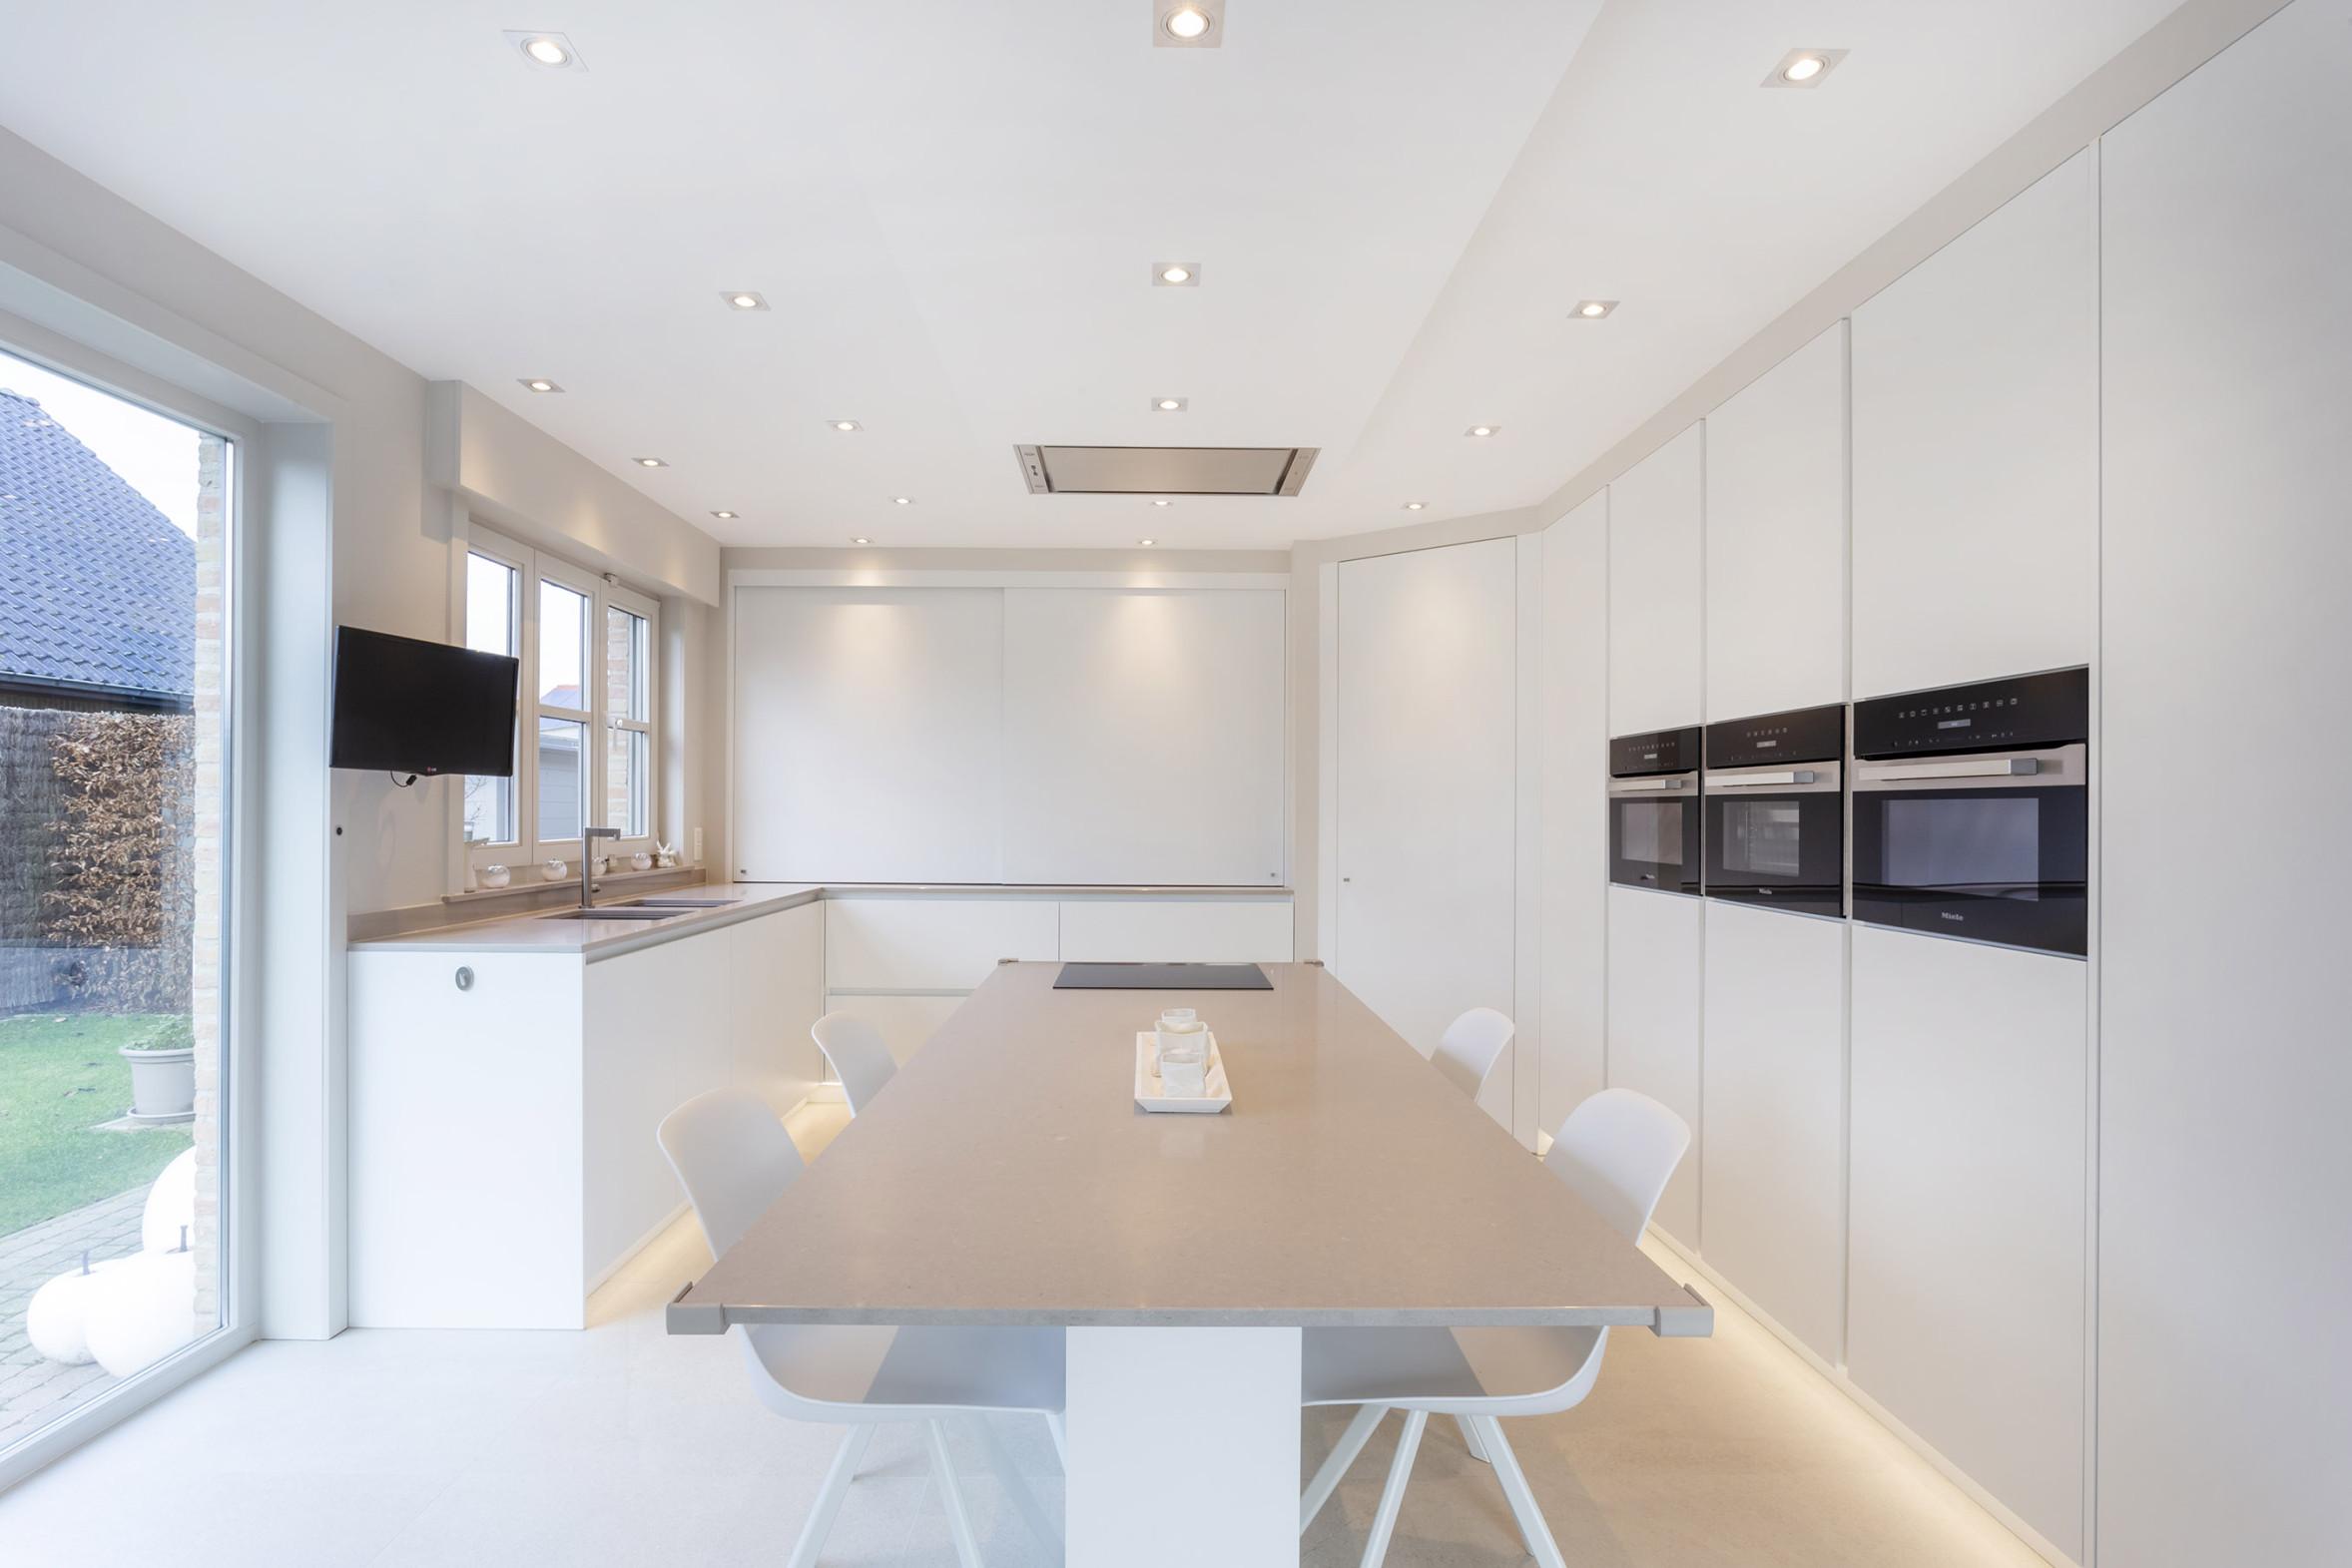 Keuken.jpg